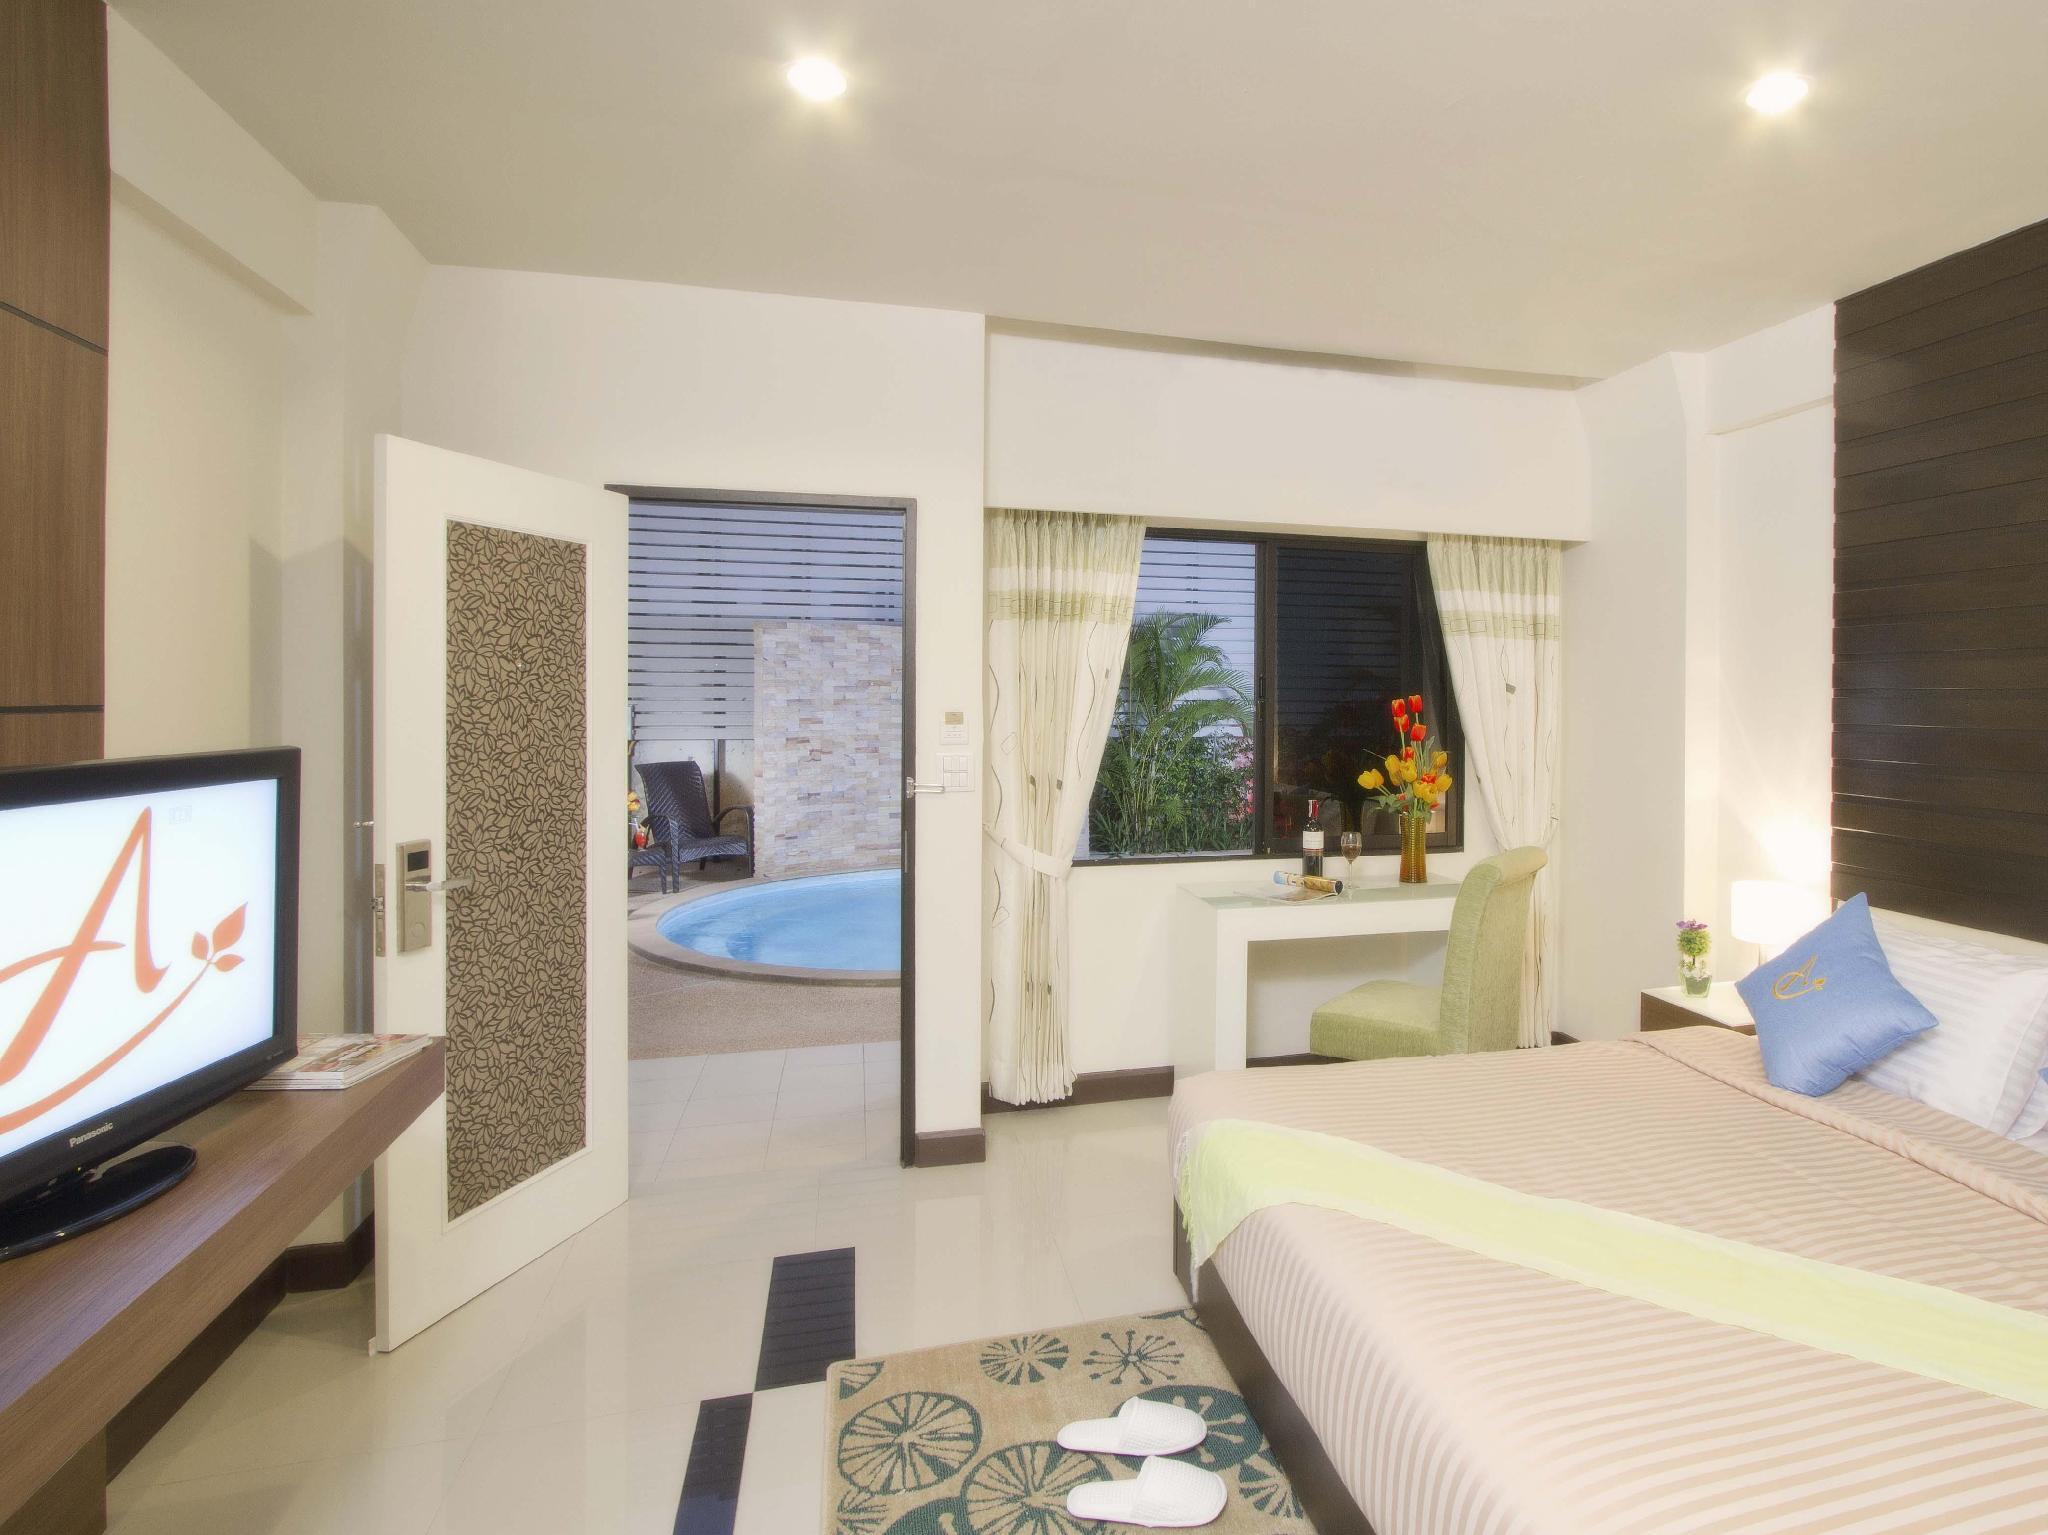 Ayara Grand Palace Hotel โรงแรมไอยรา แกรนด์ พาเลซ